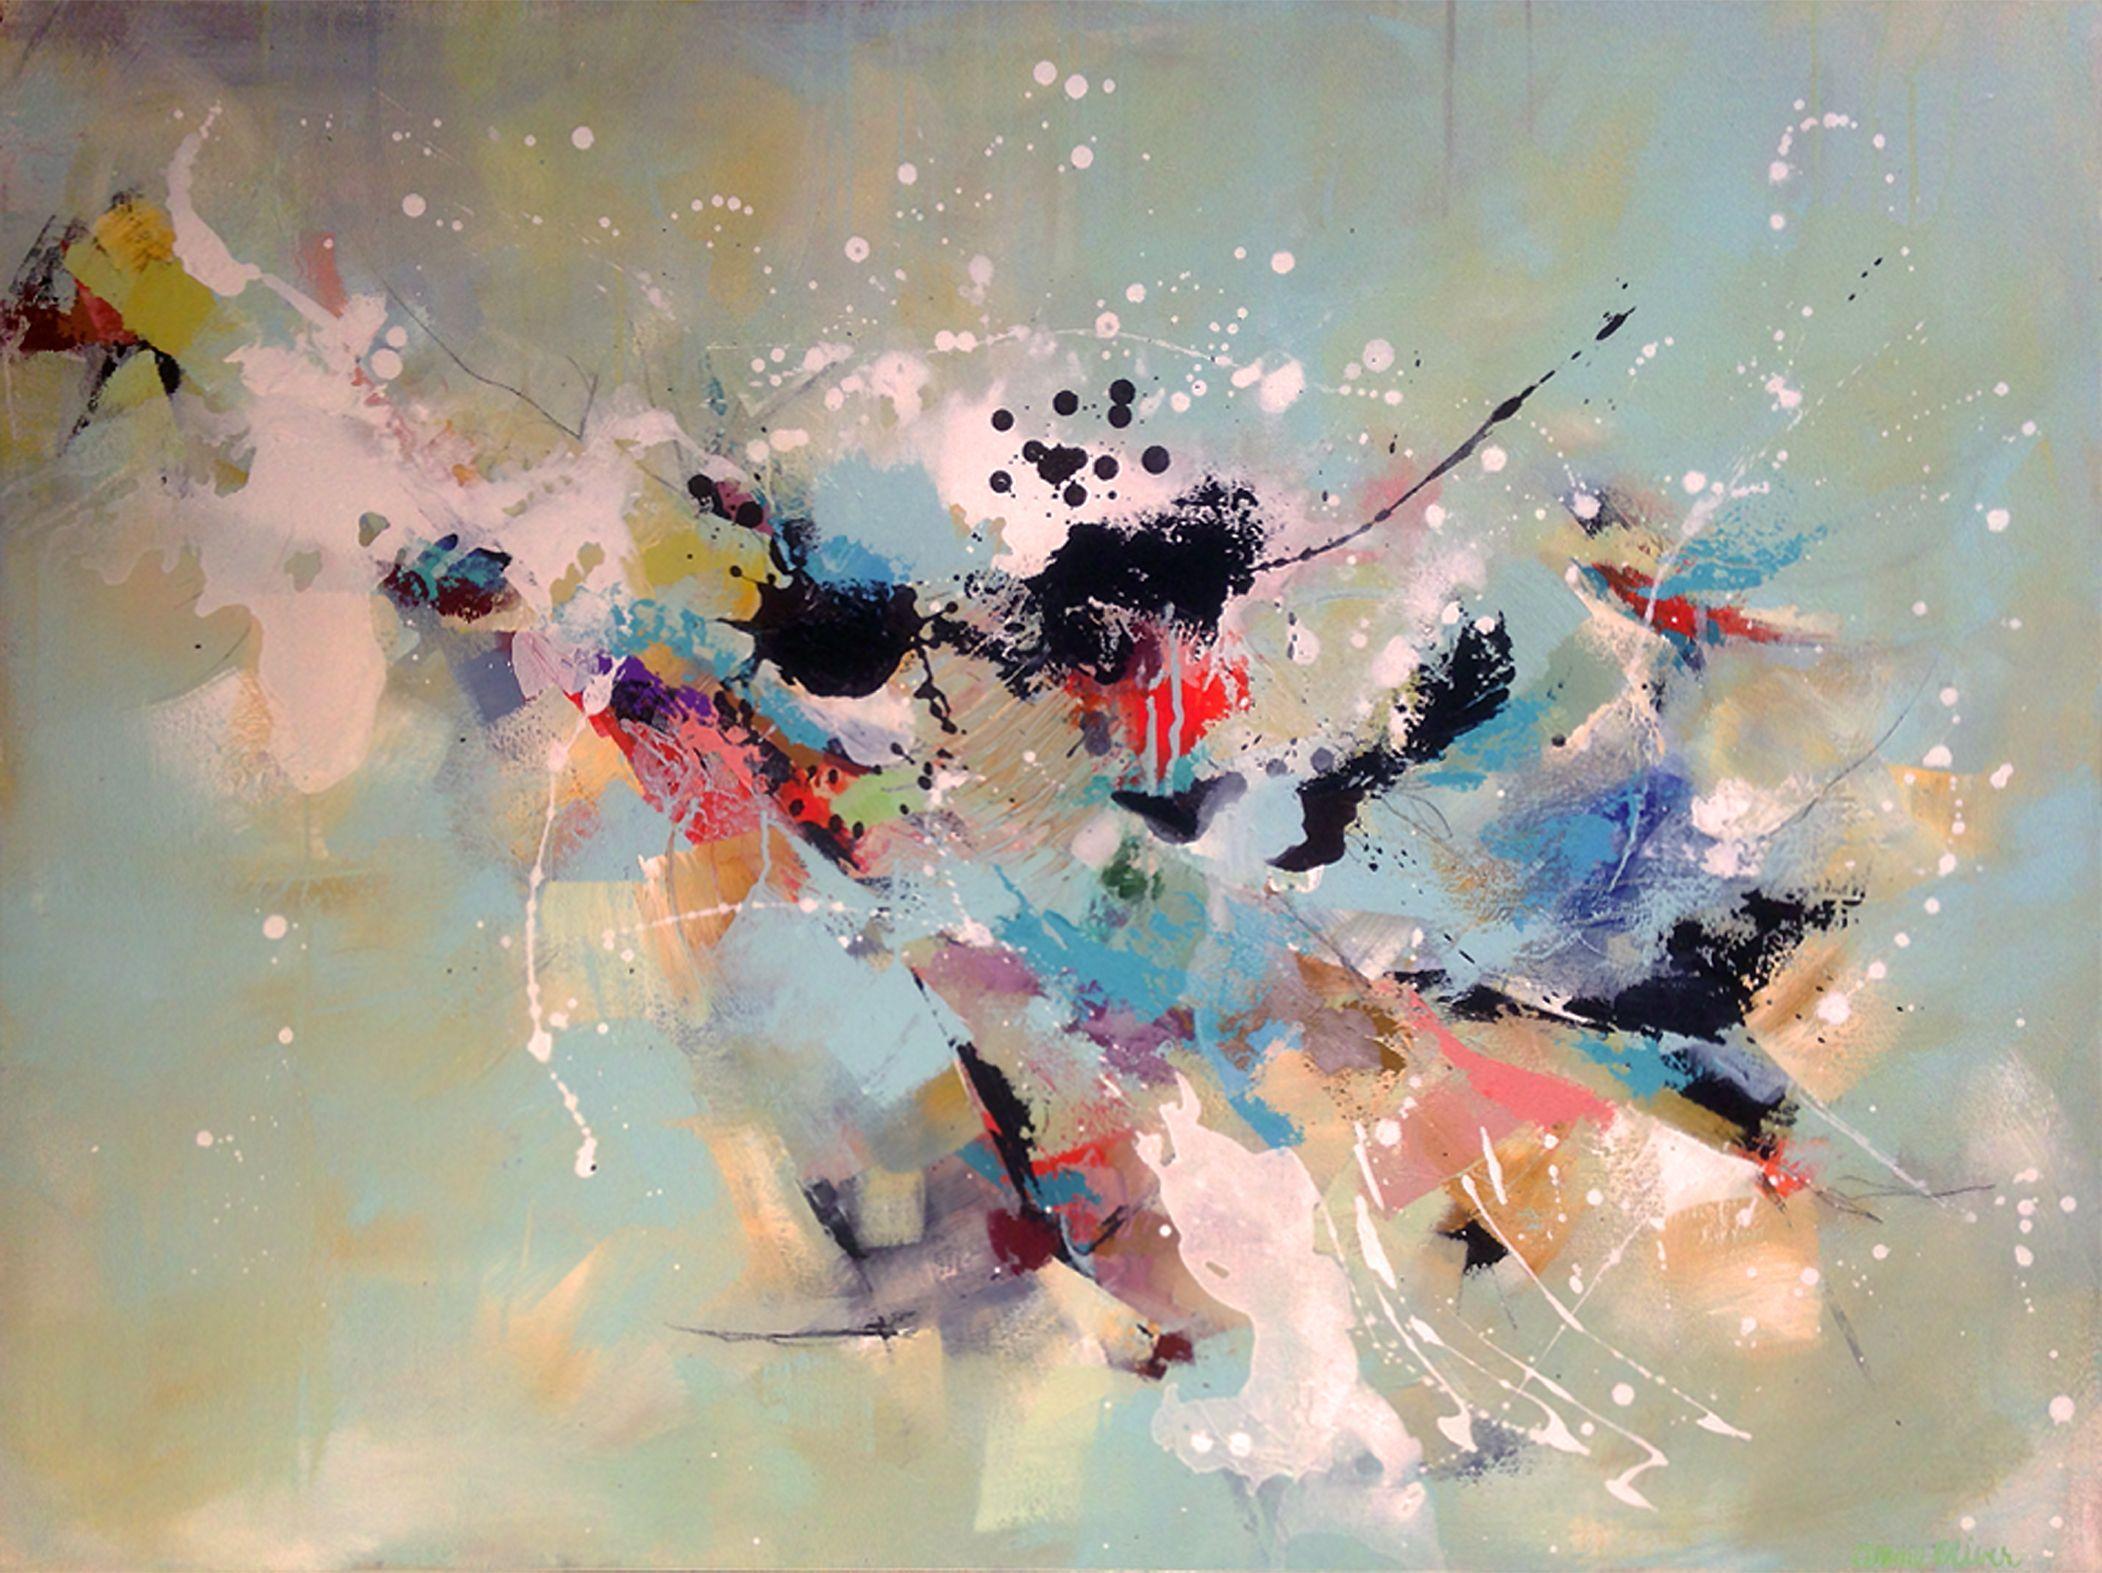 il Viaggio, Painting, Acrylic on Canvas